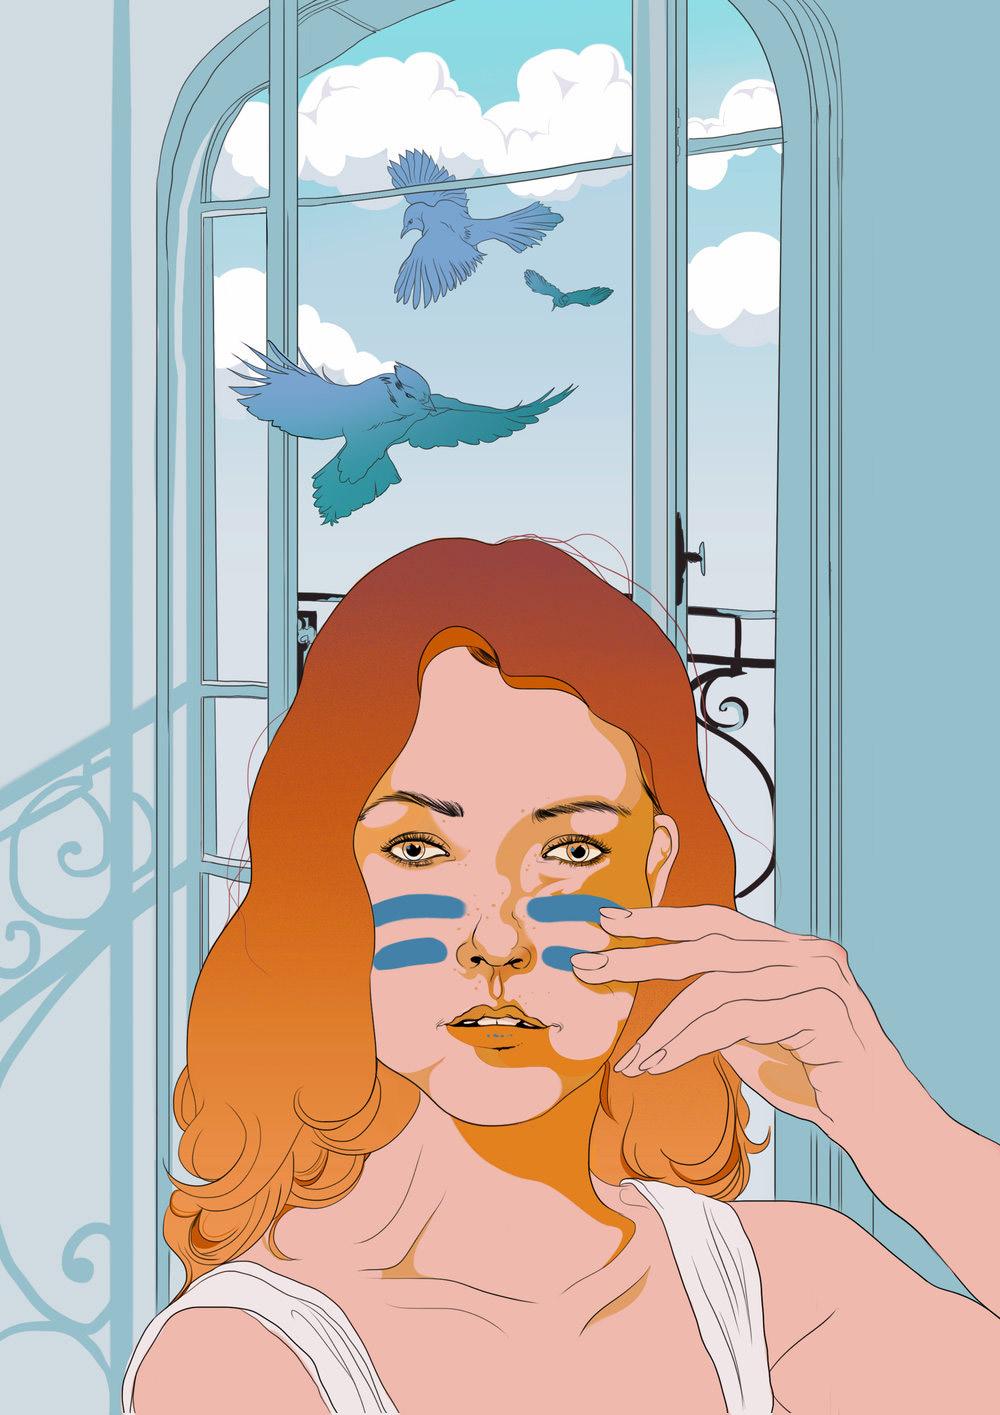 Janelle Barone漫画书风格插画作品欣赏